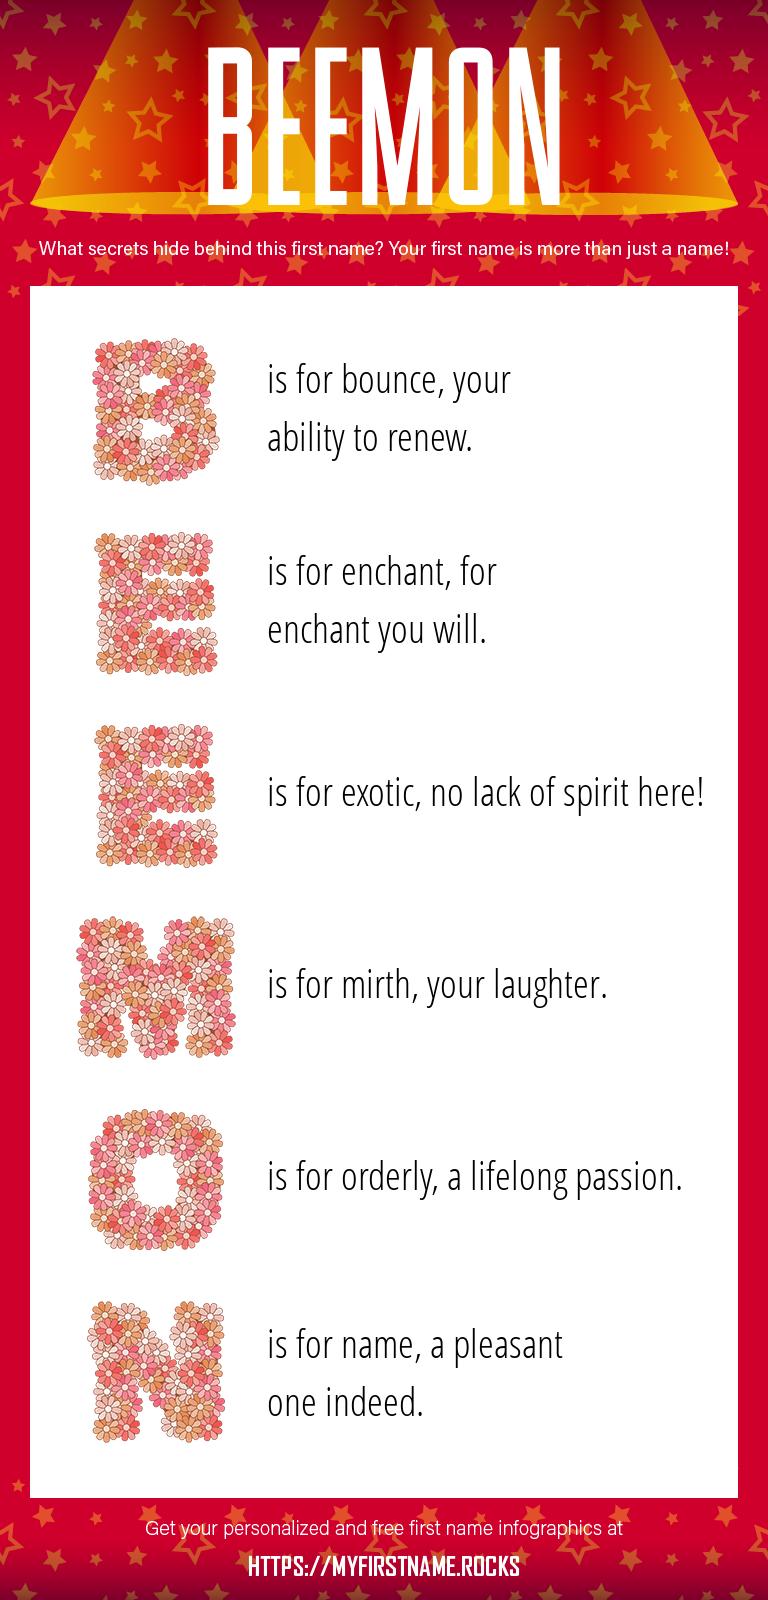 Beemon Infographics